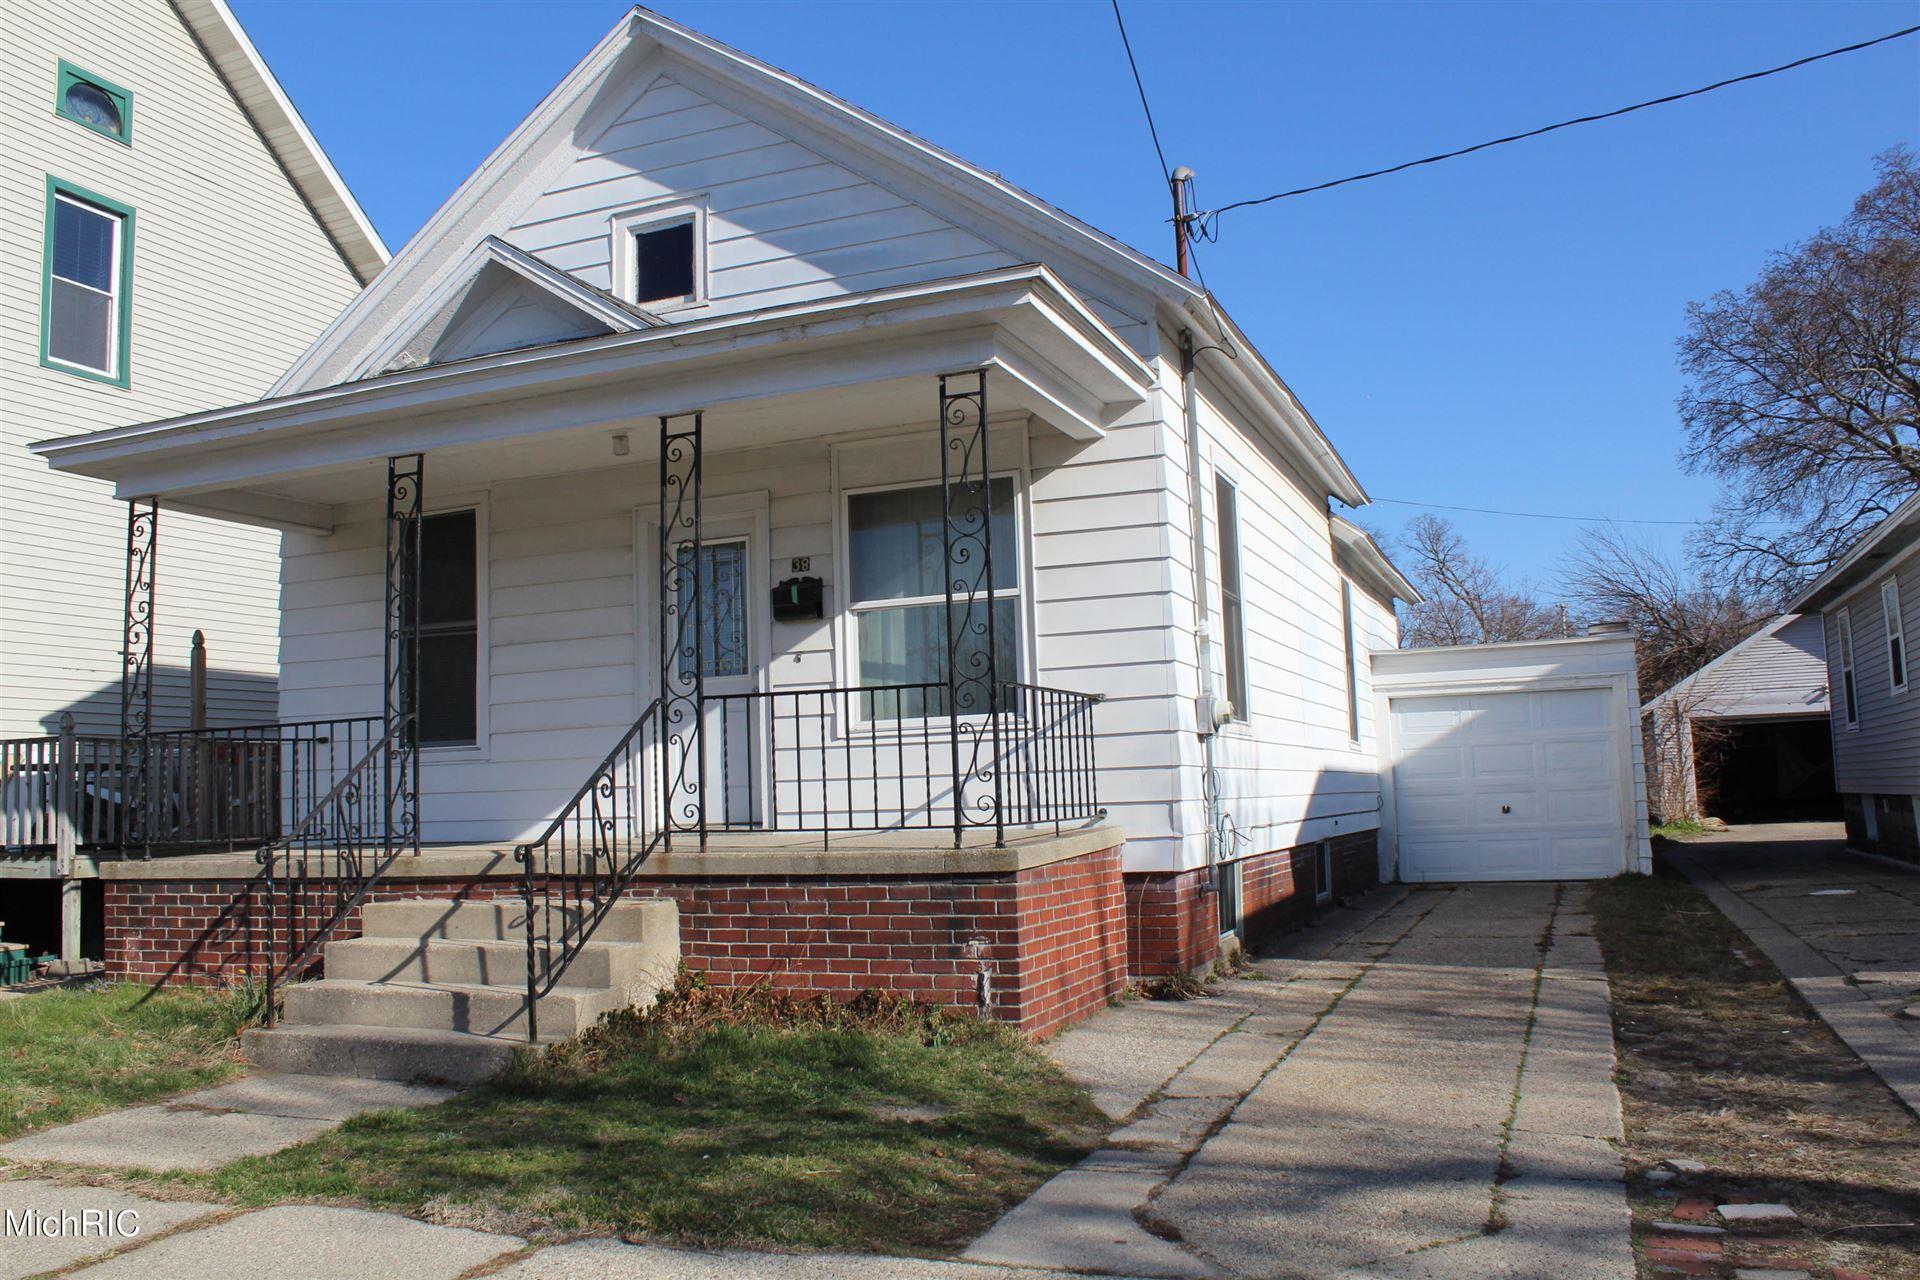 Photo of 38 W Larch Avenue, Muskegon, MI 49441 (MLS # 21011249)